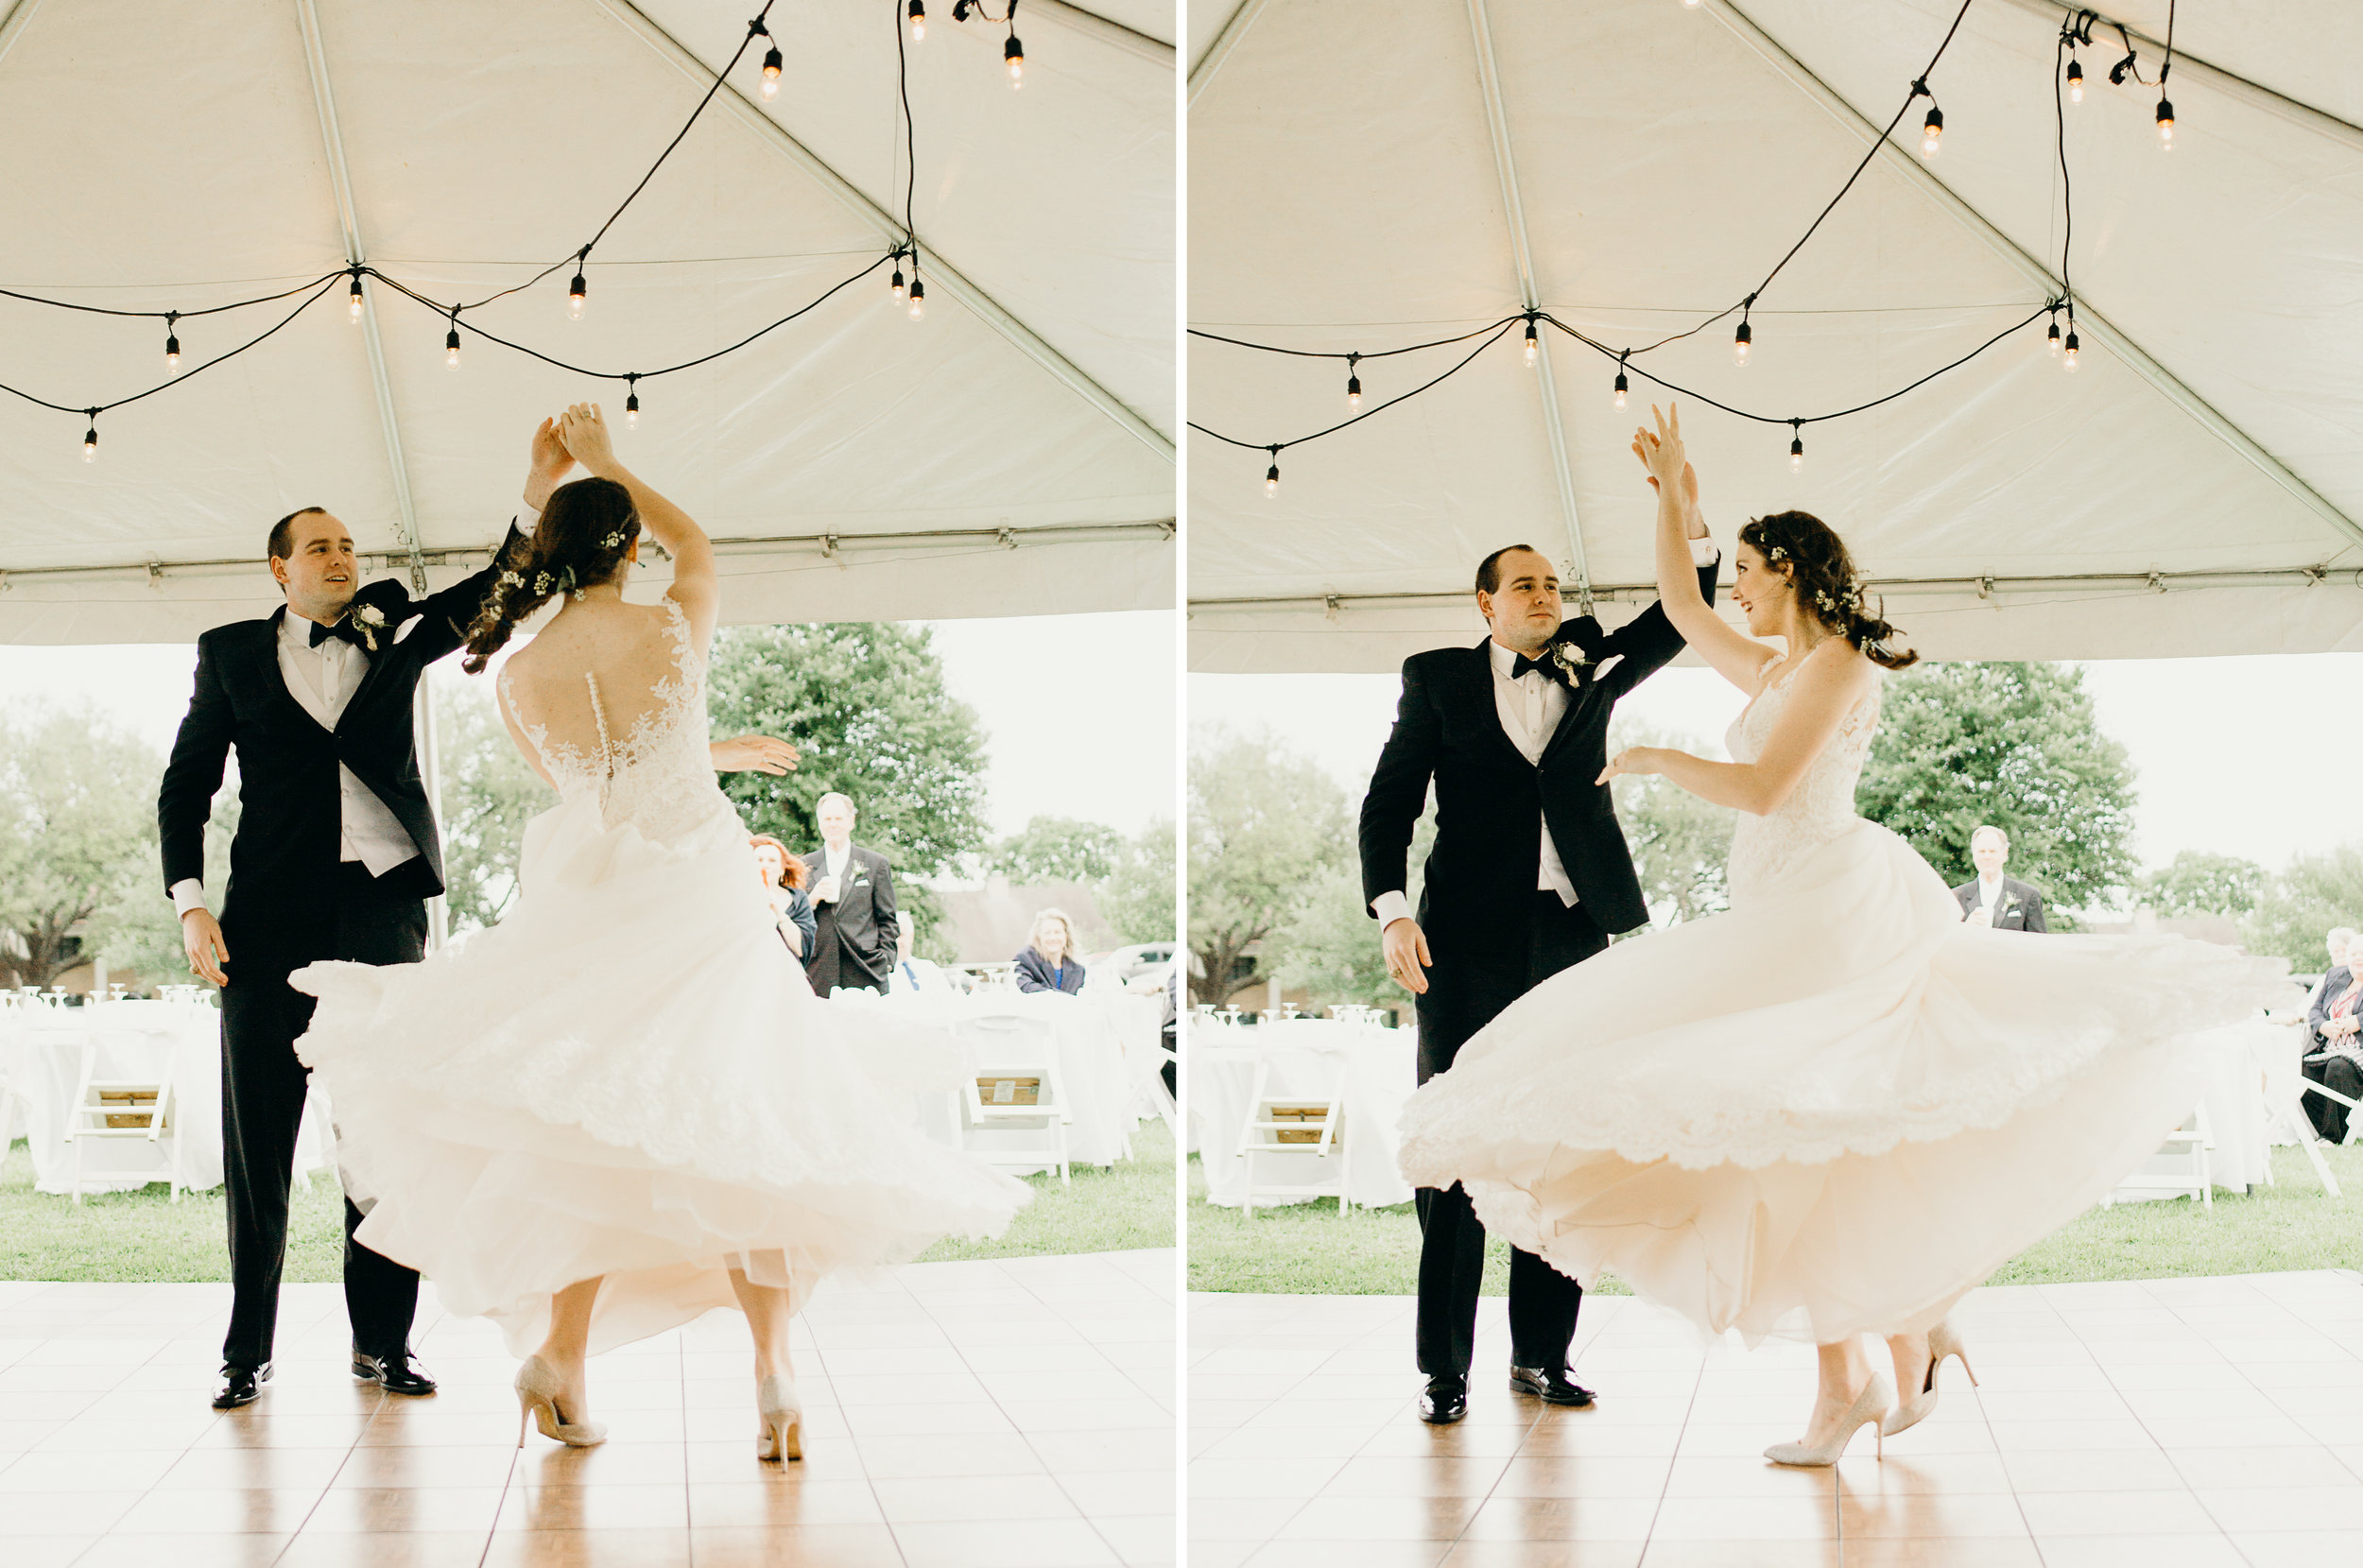 john twirling his wife.jpg